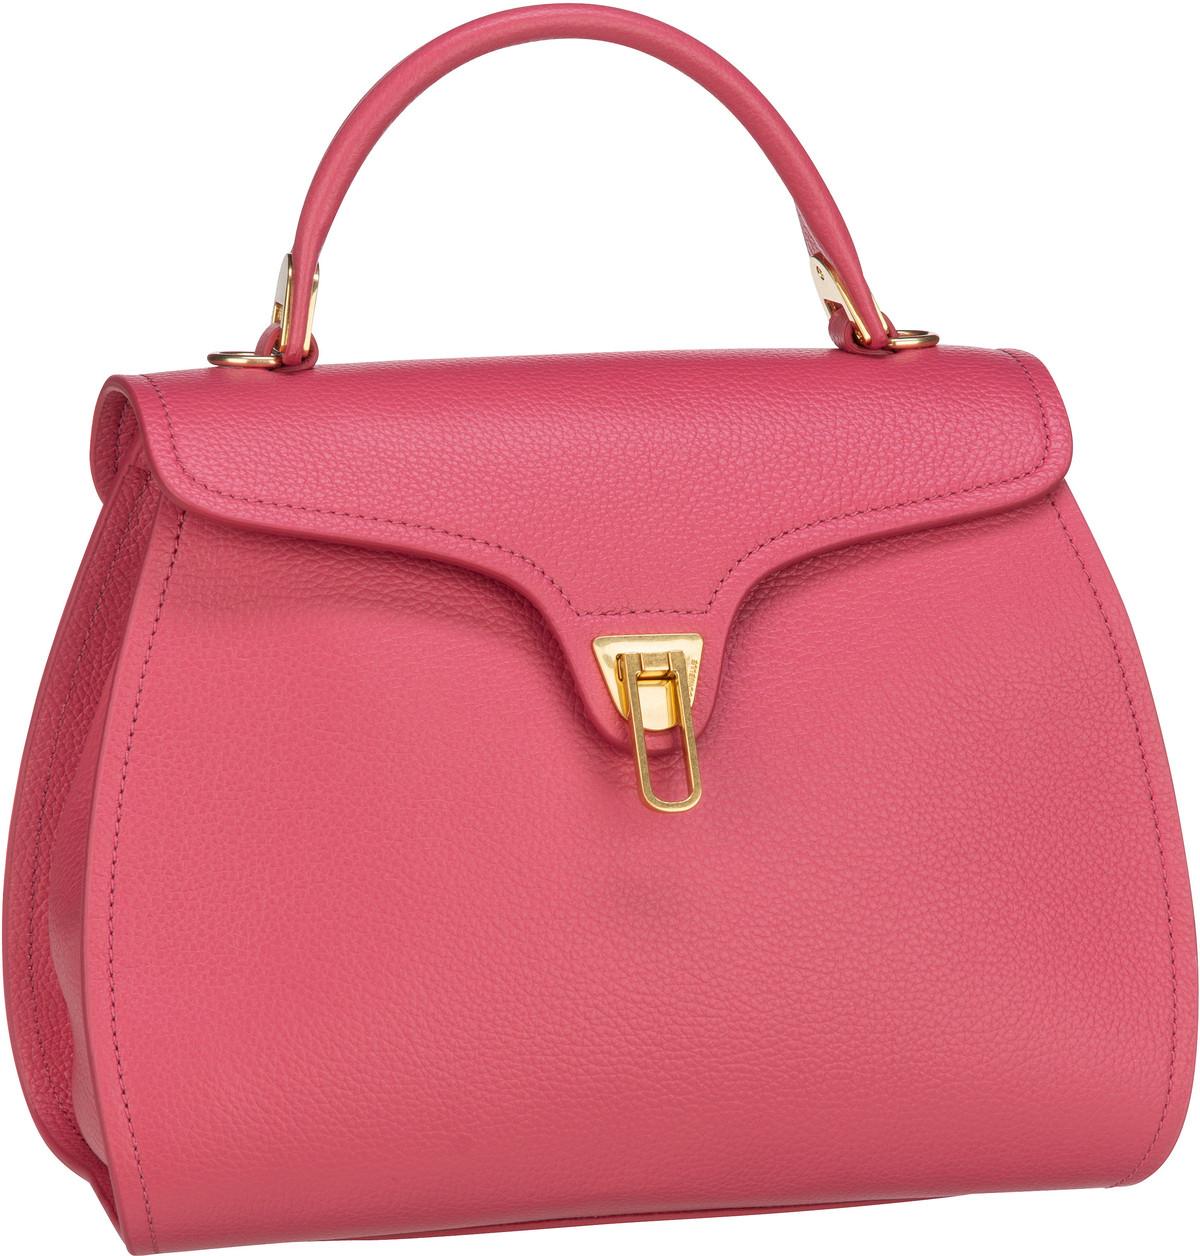 Handtasche Marvin 1803 Bouganville